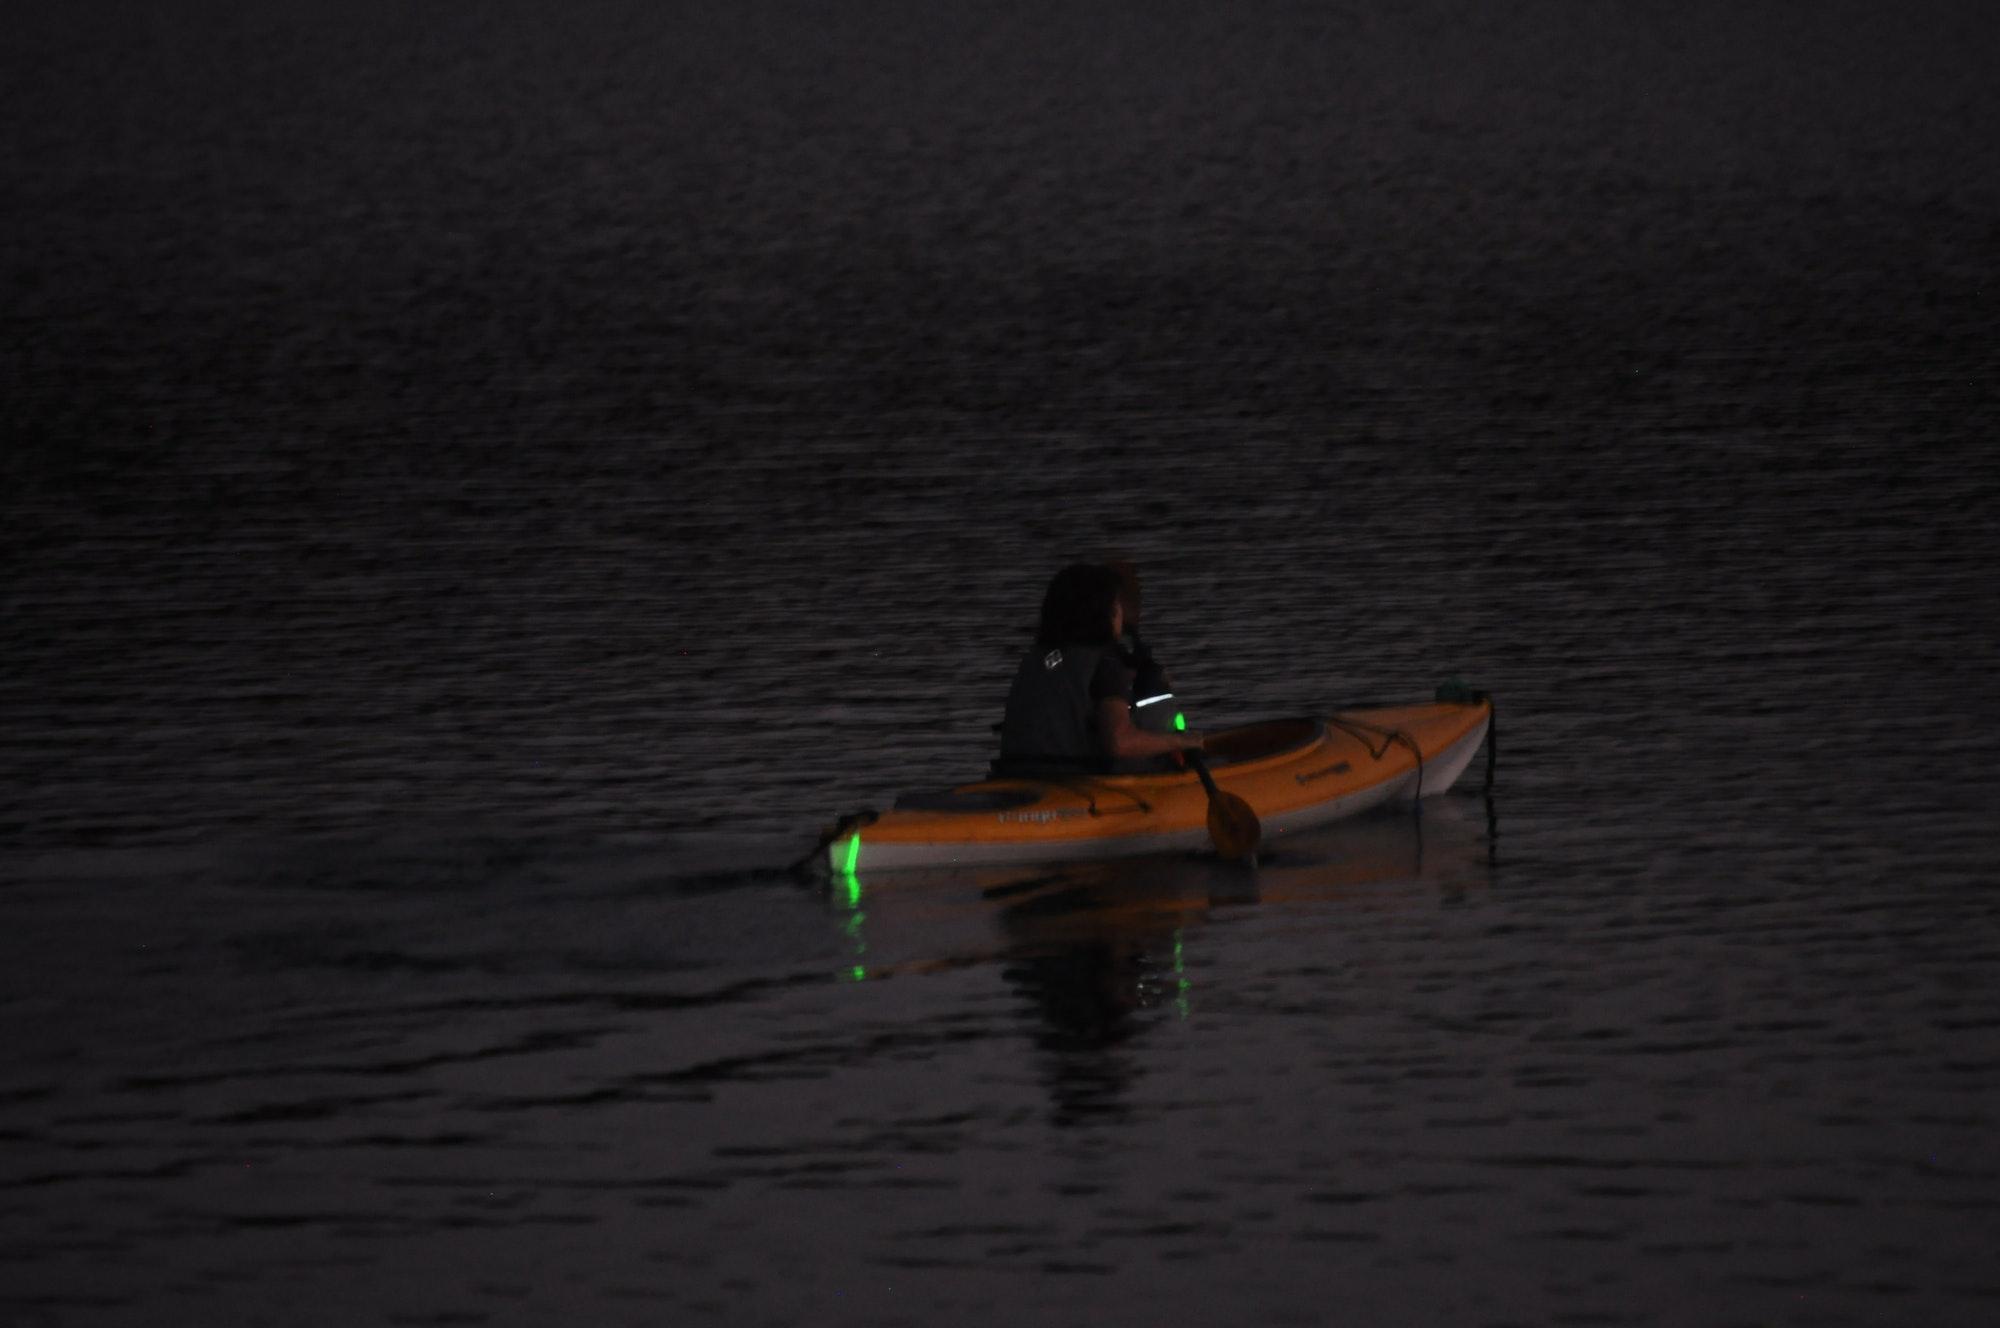 May contain: human, person, vehicle, transportation, boat, rowboat, and canoe